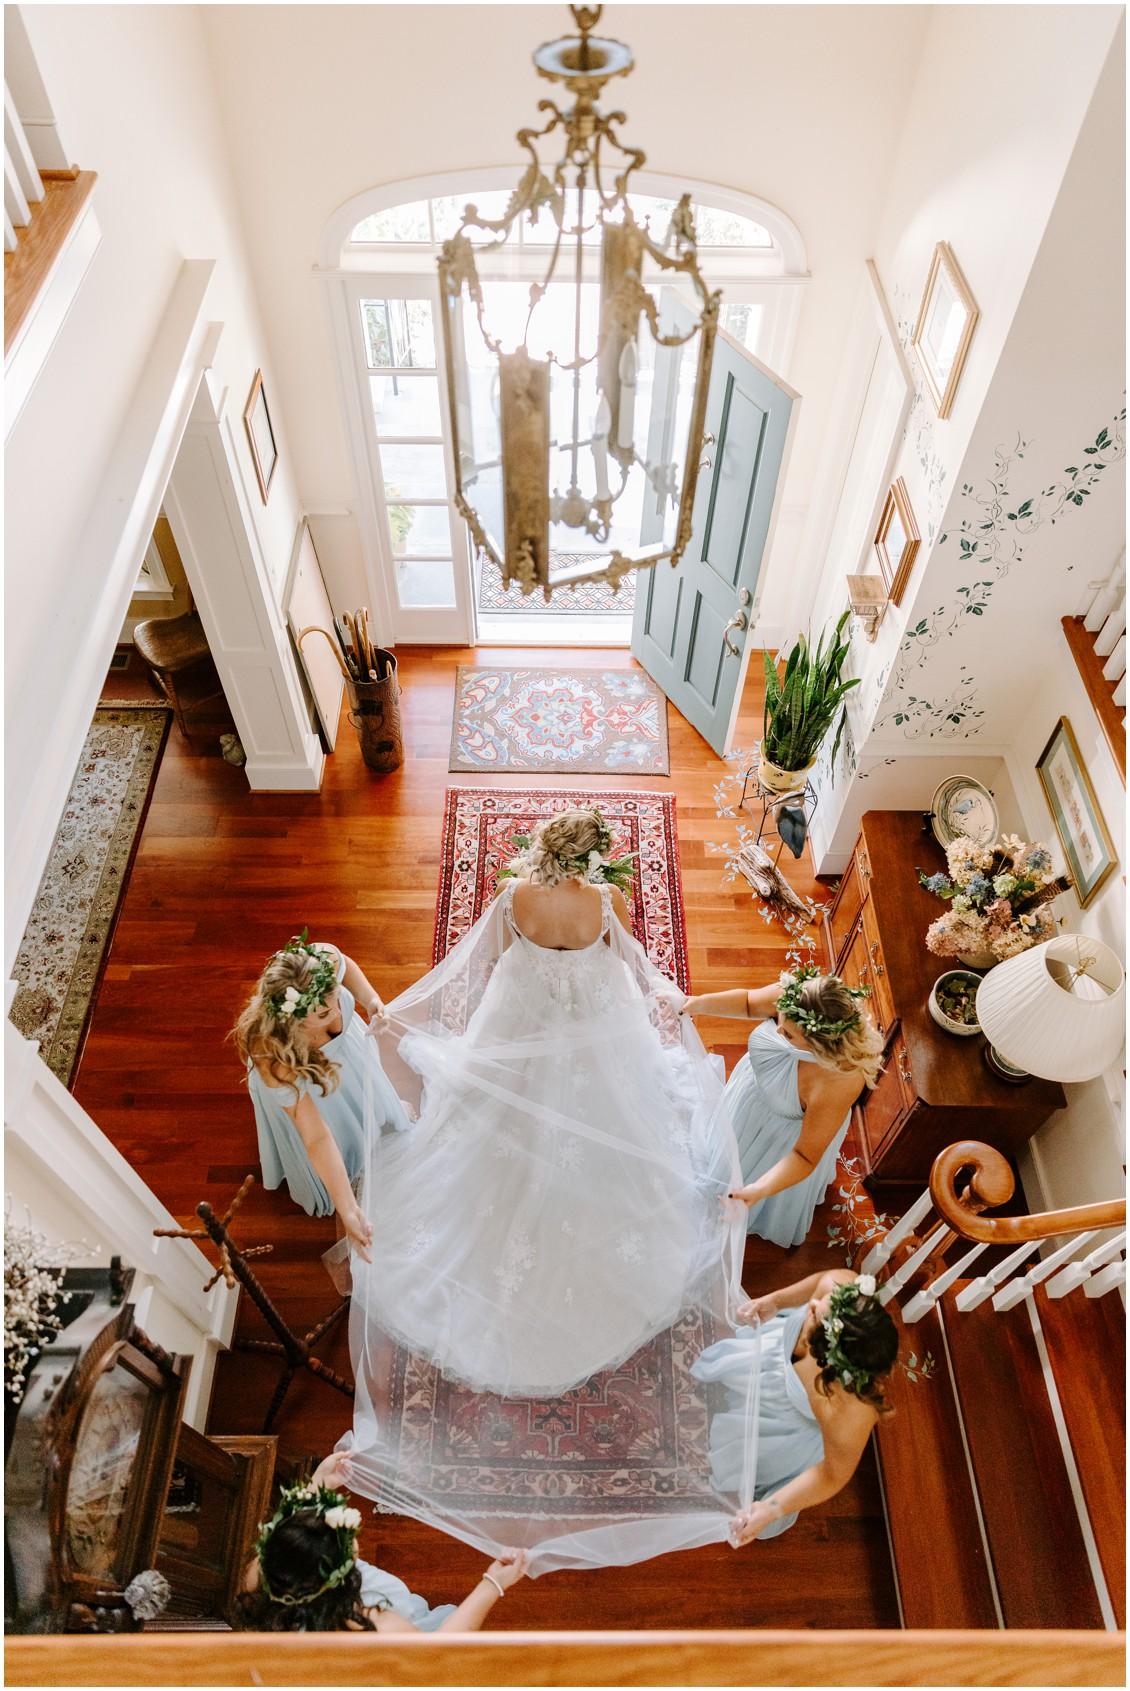 Bridal cape detail from balcony | My Eastern Shore Wedding | Sherwood Florist